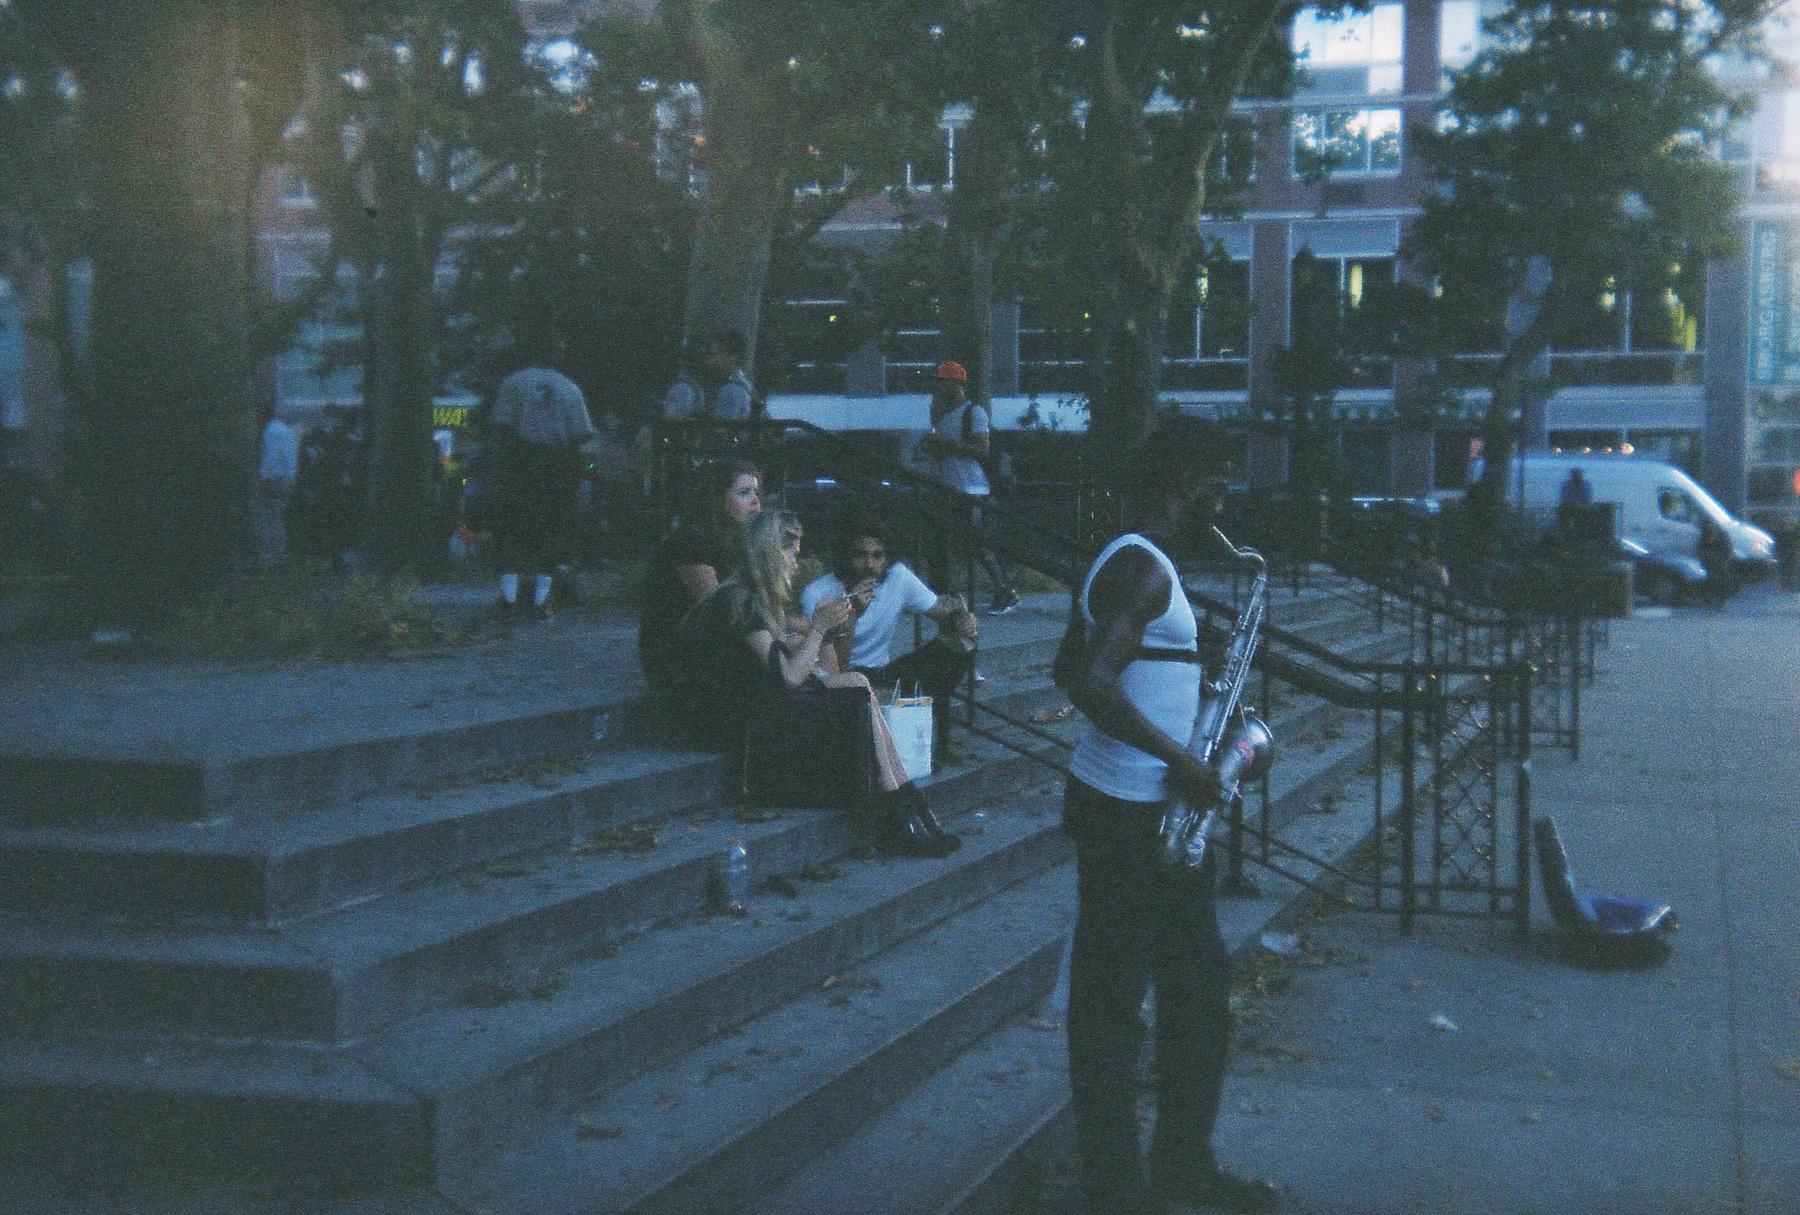 Sara D Roosevelt Park  New York City  Photography: Wil Harcrow